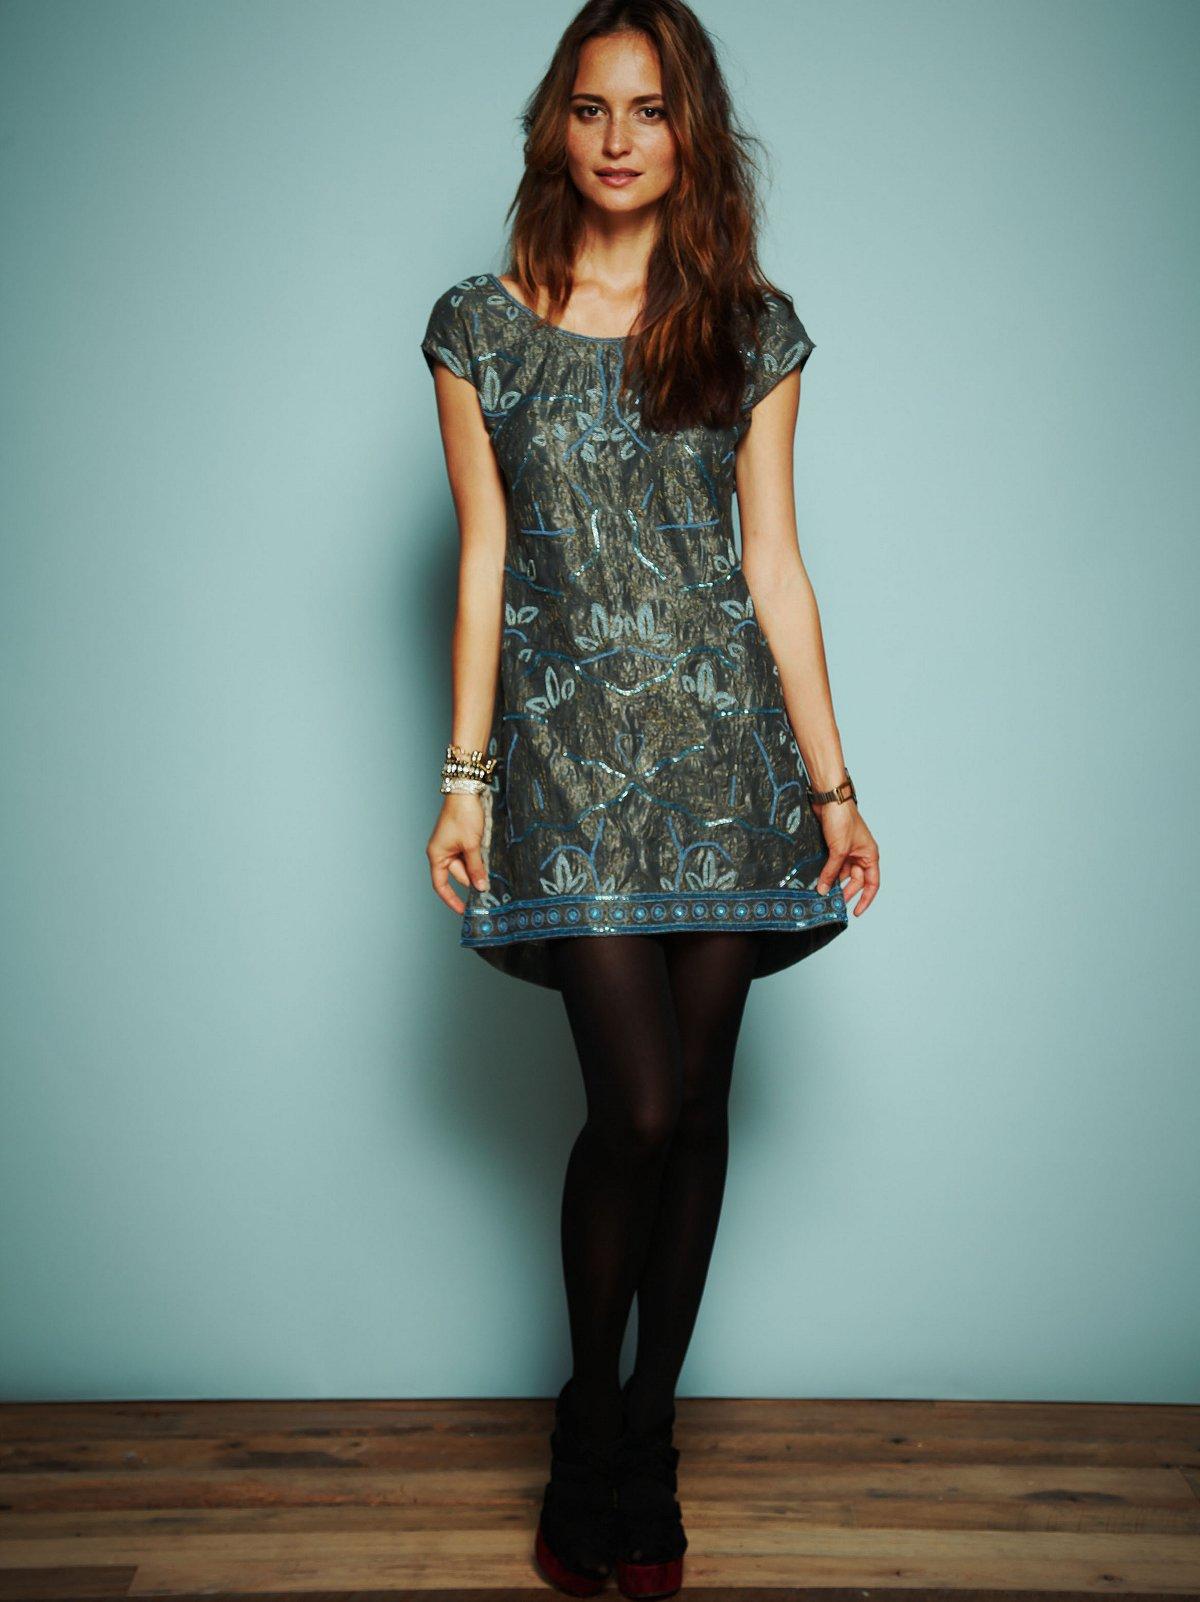 Rachel's Limited Edition Liquid Gold Dress